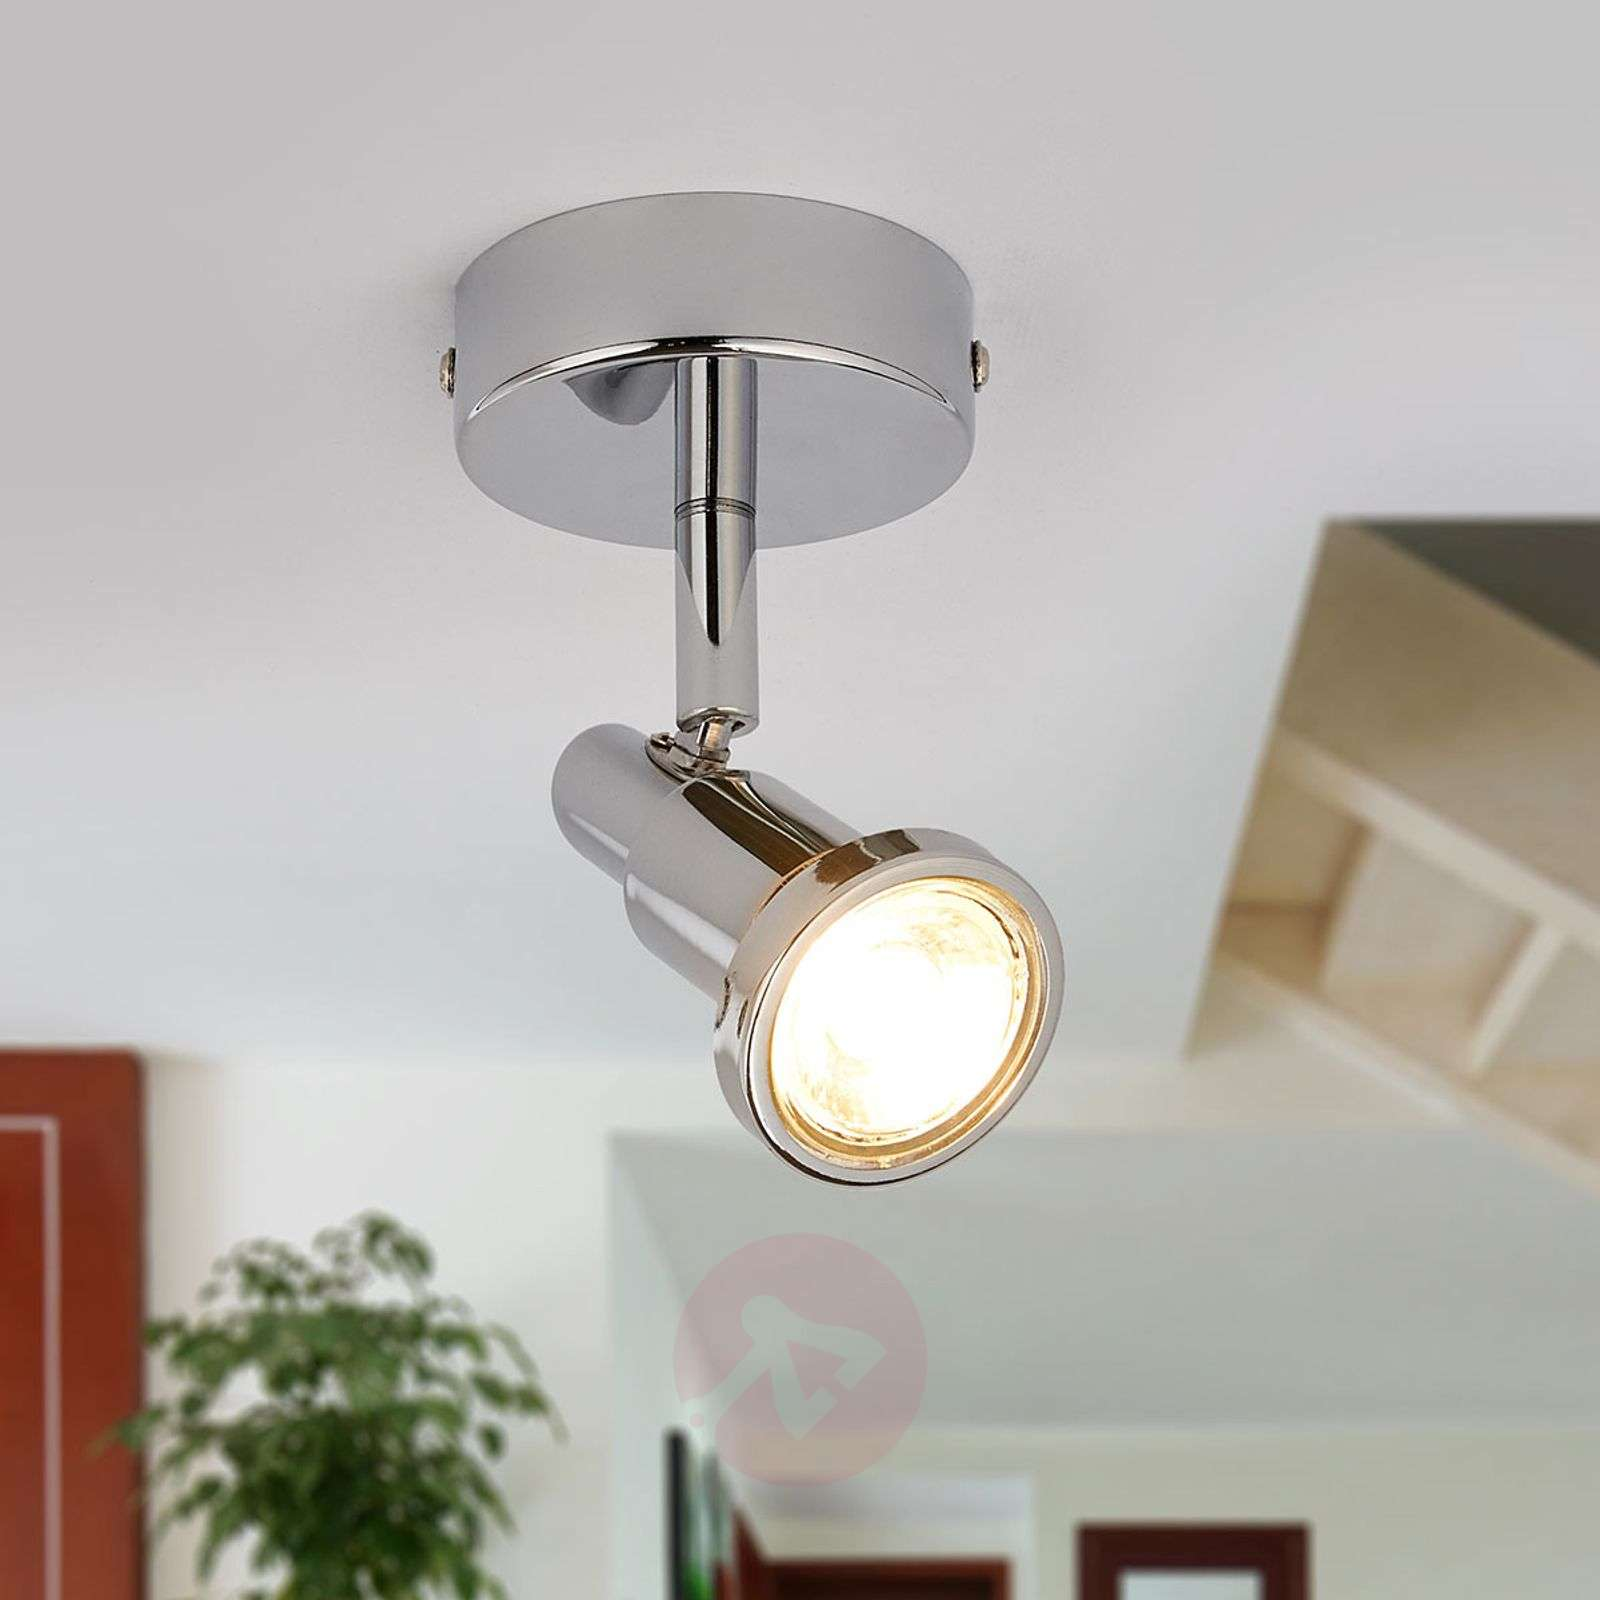 Chrome-plated LED spotlight Thom, GU10-9954011-02